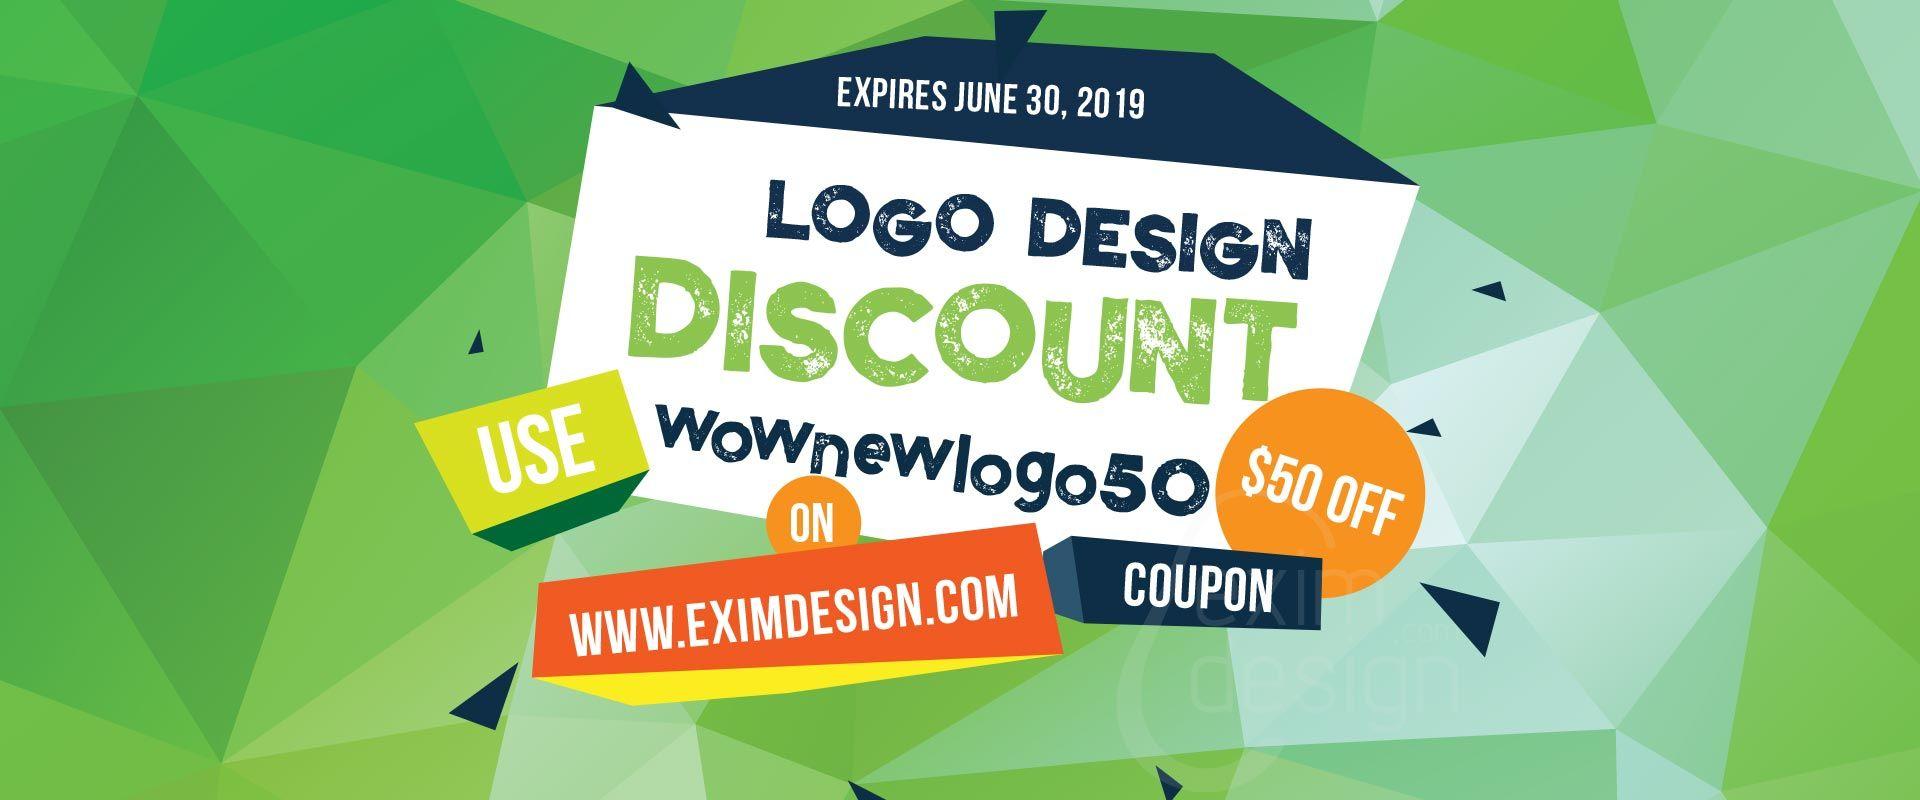 Discount for logo design